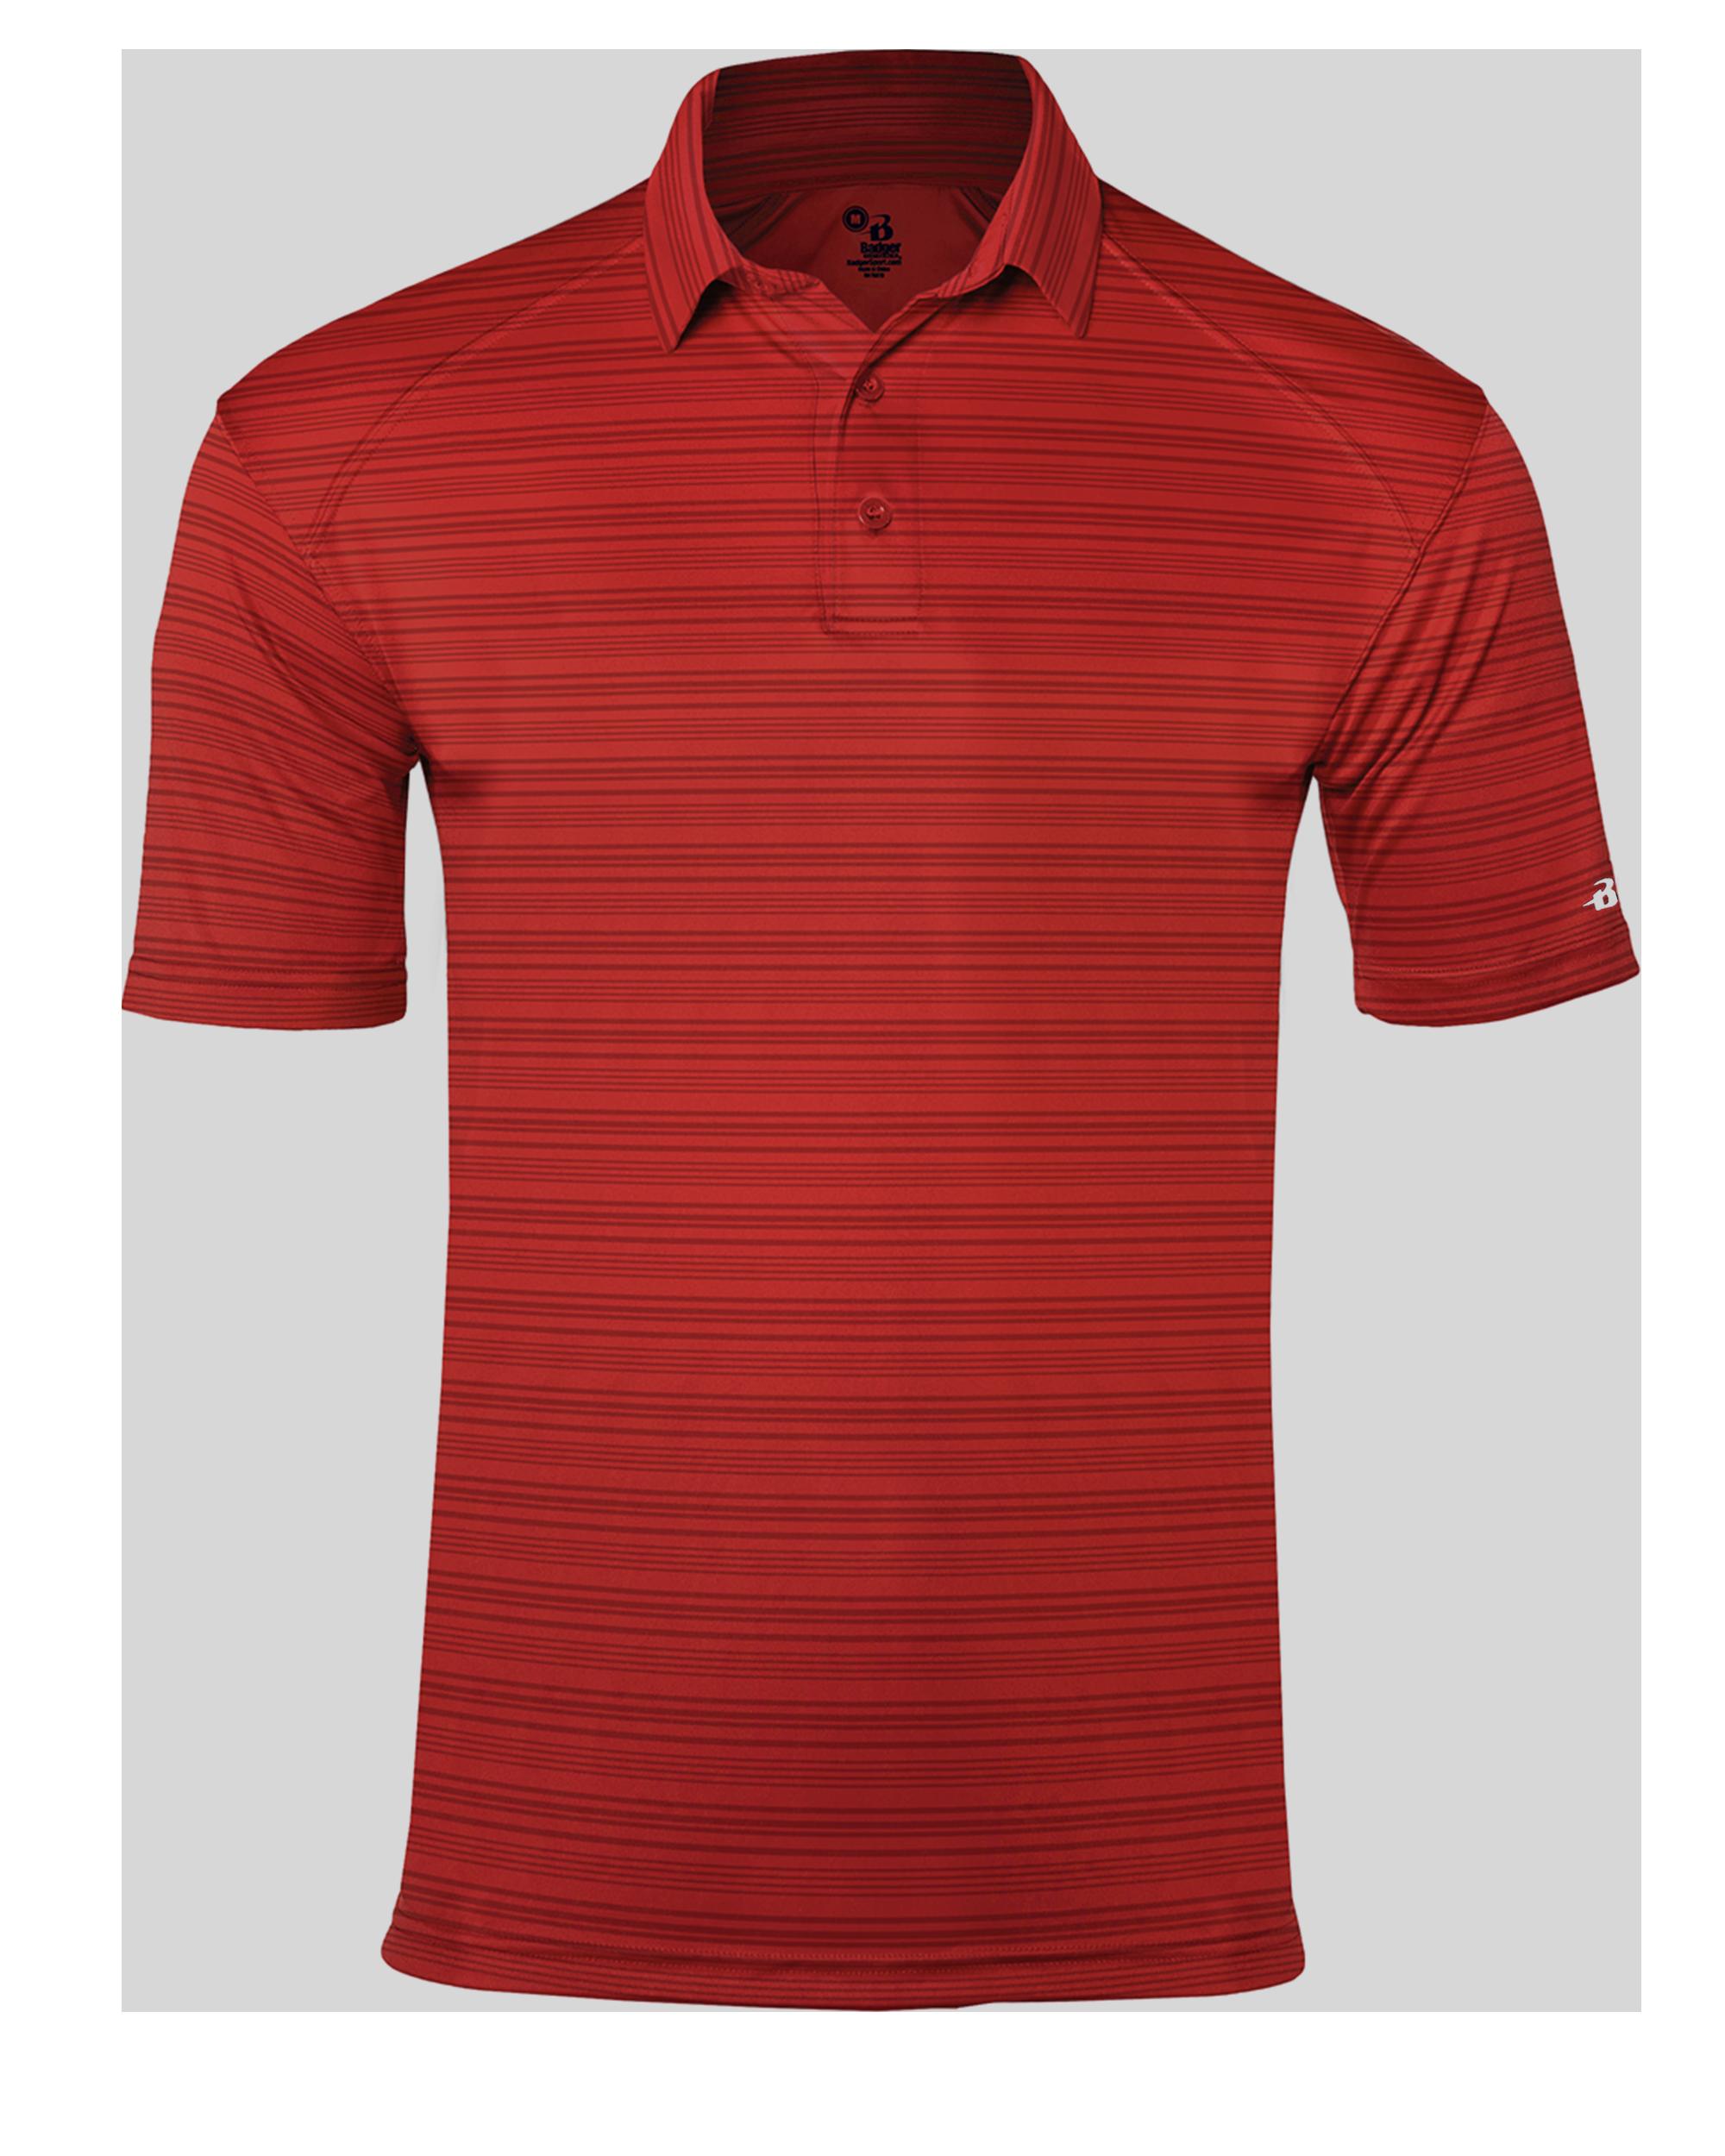 Stripe Polo - Red Stripe